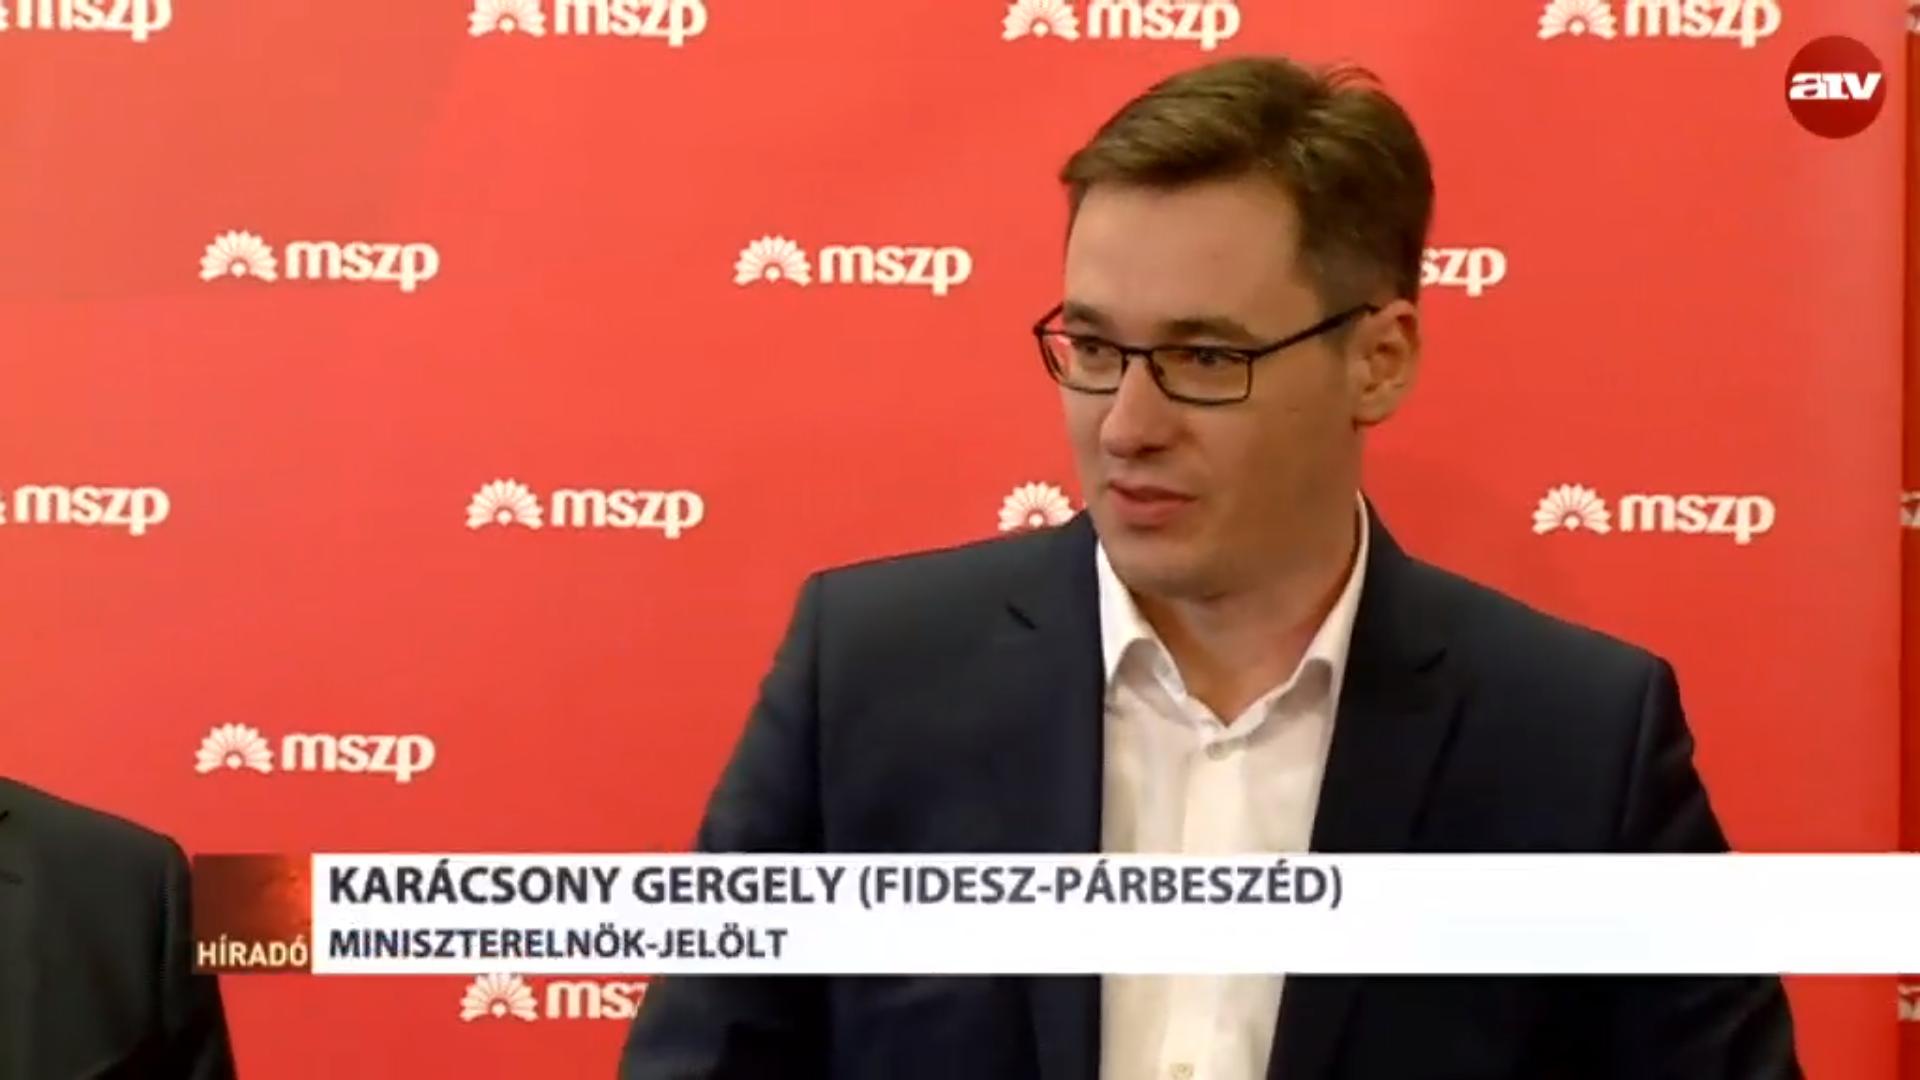 fidesz-parbeszed.png